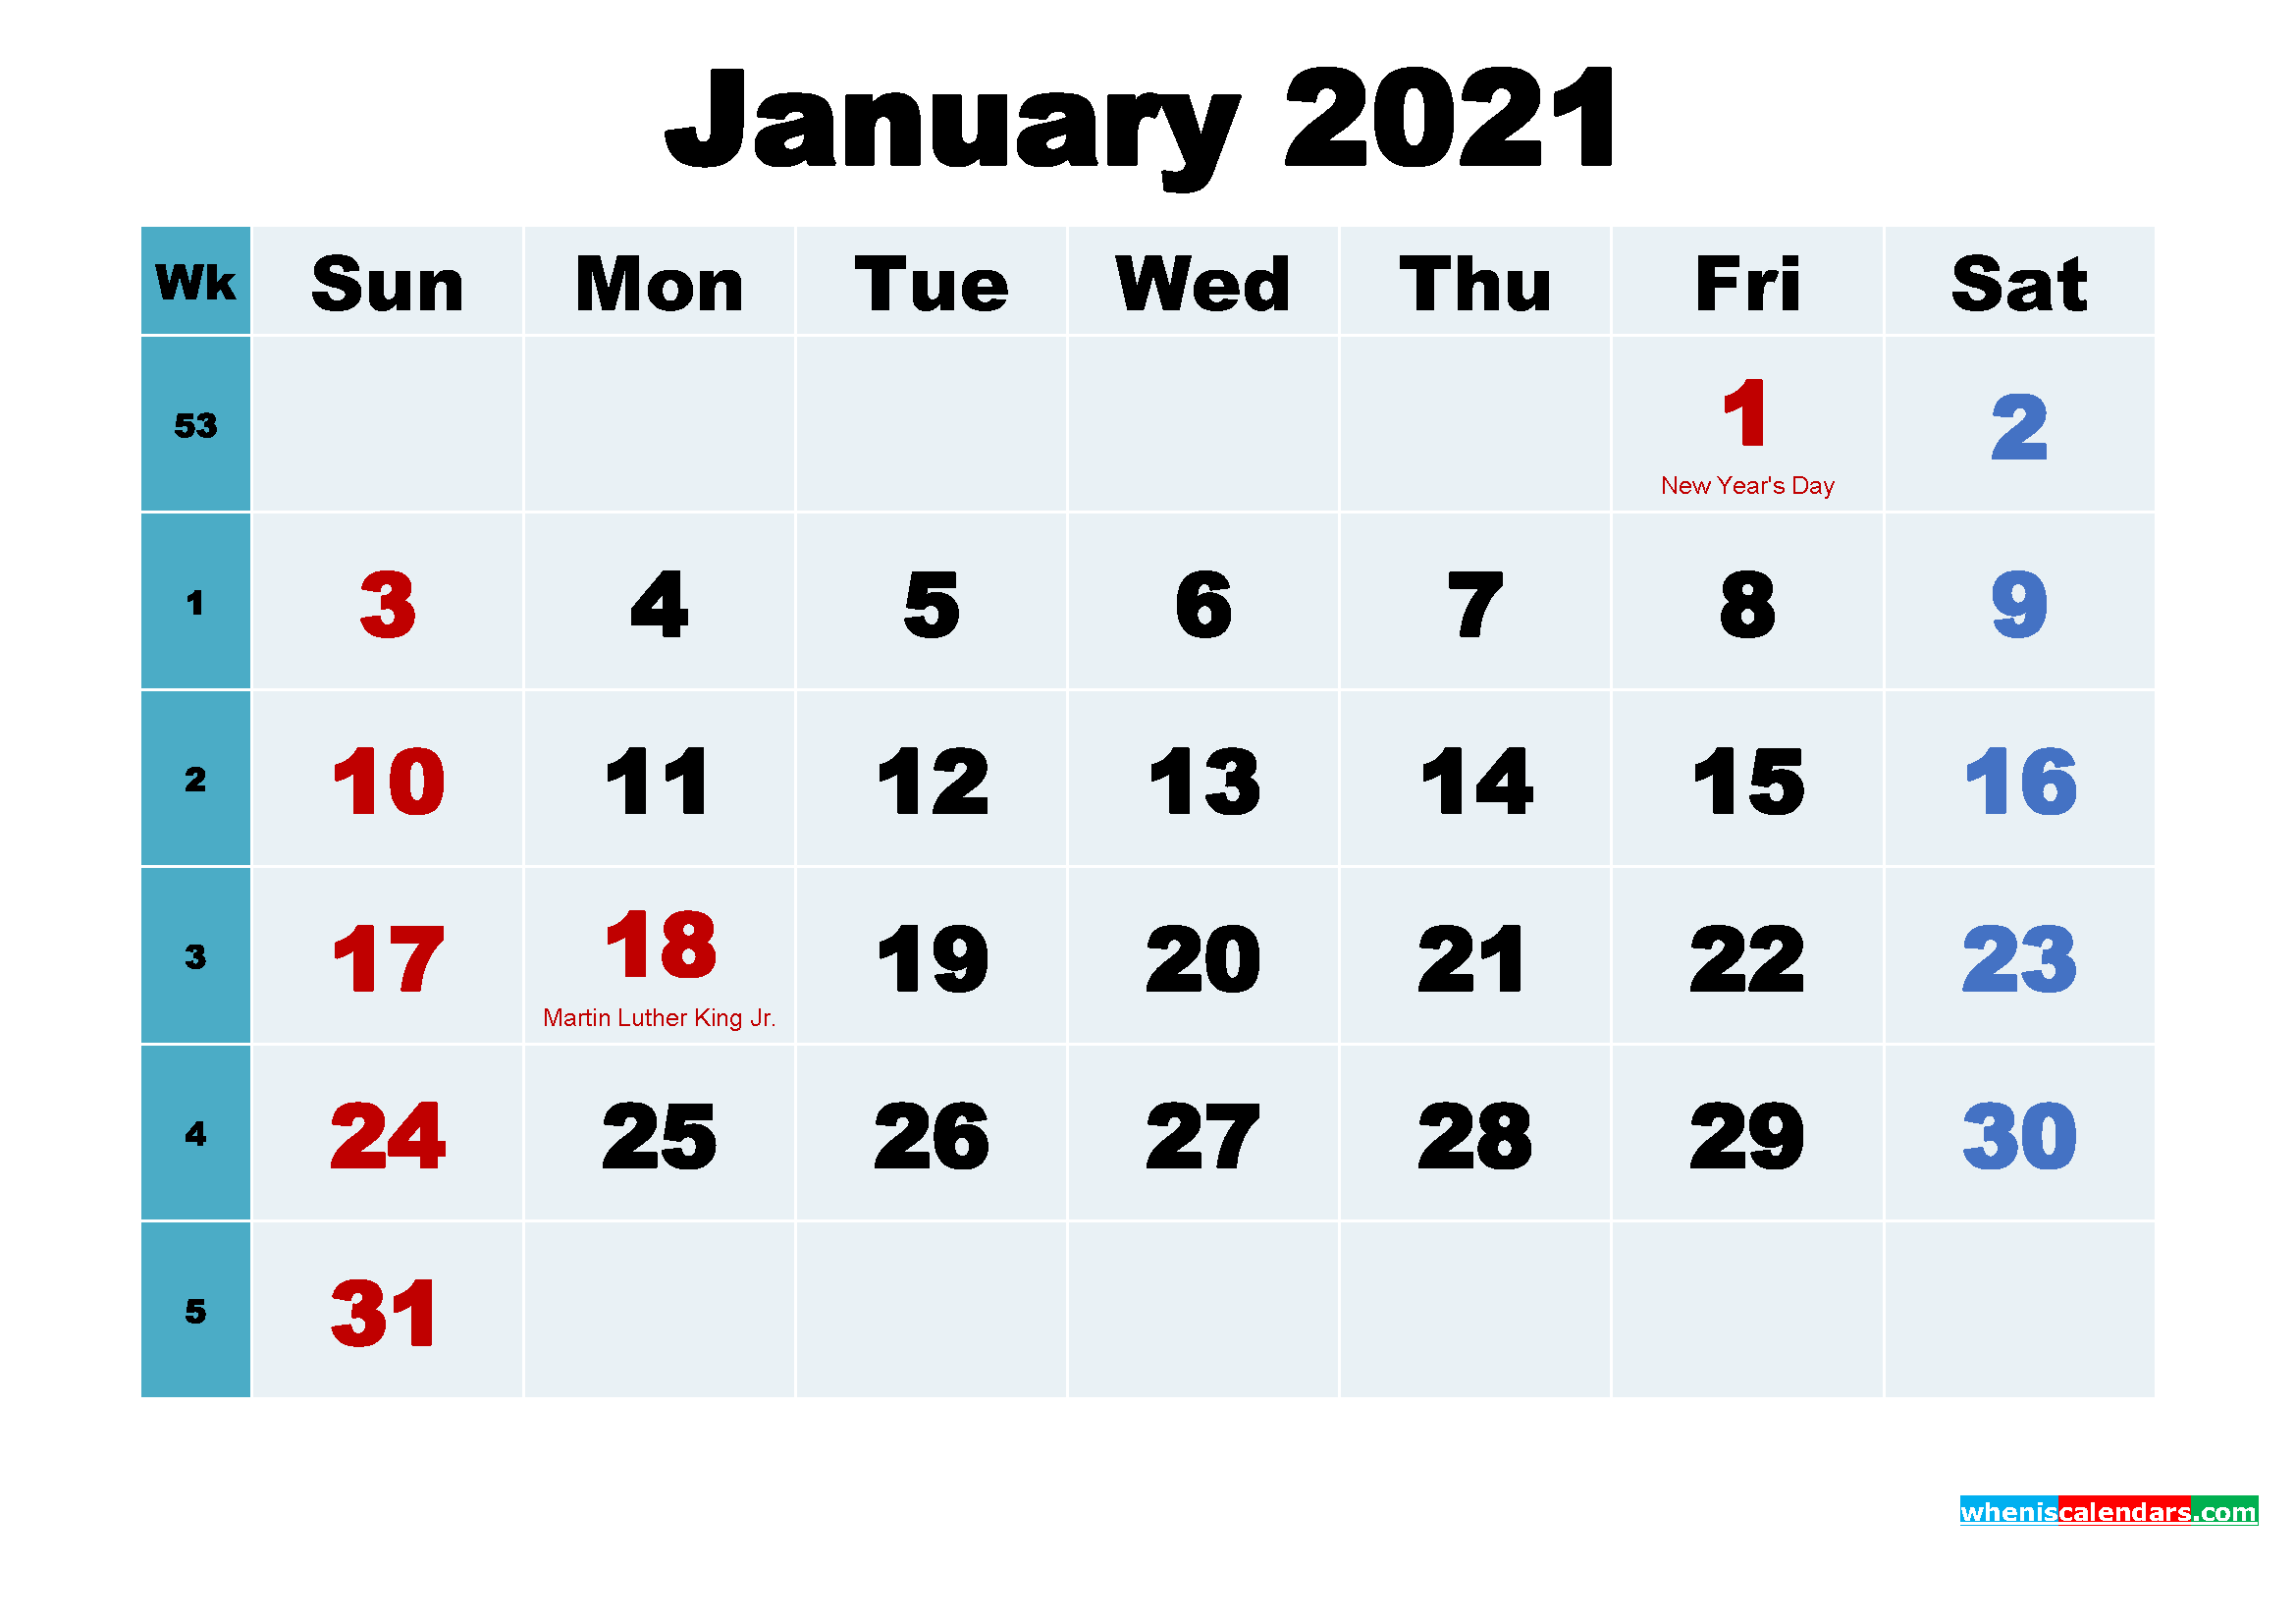 Free Printable January 2021 Calendar Wallpaper